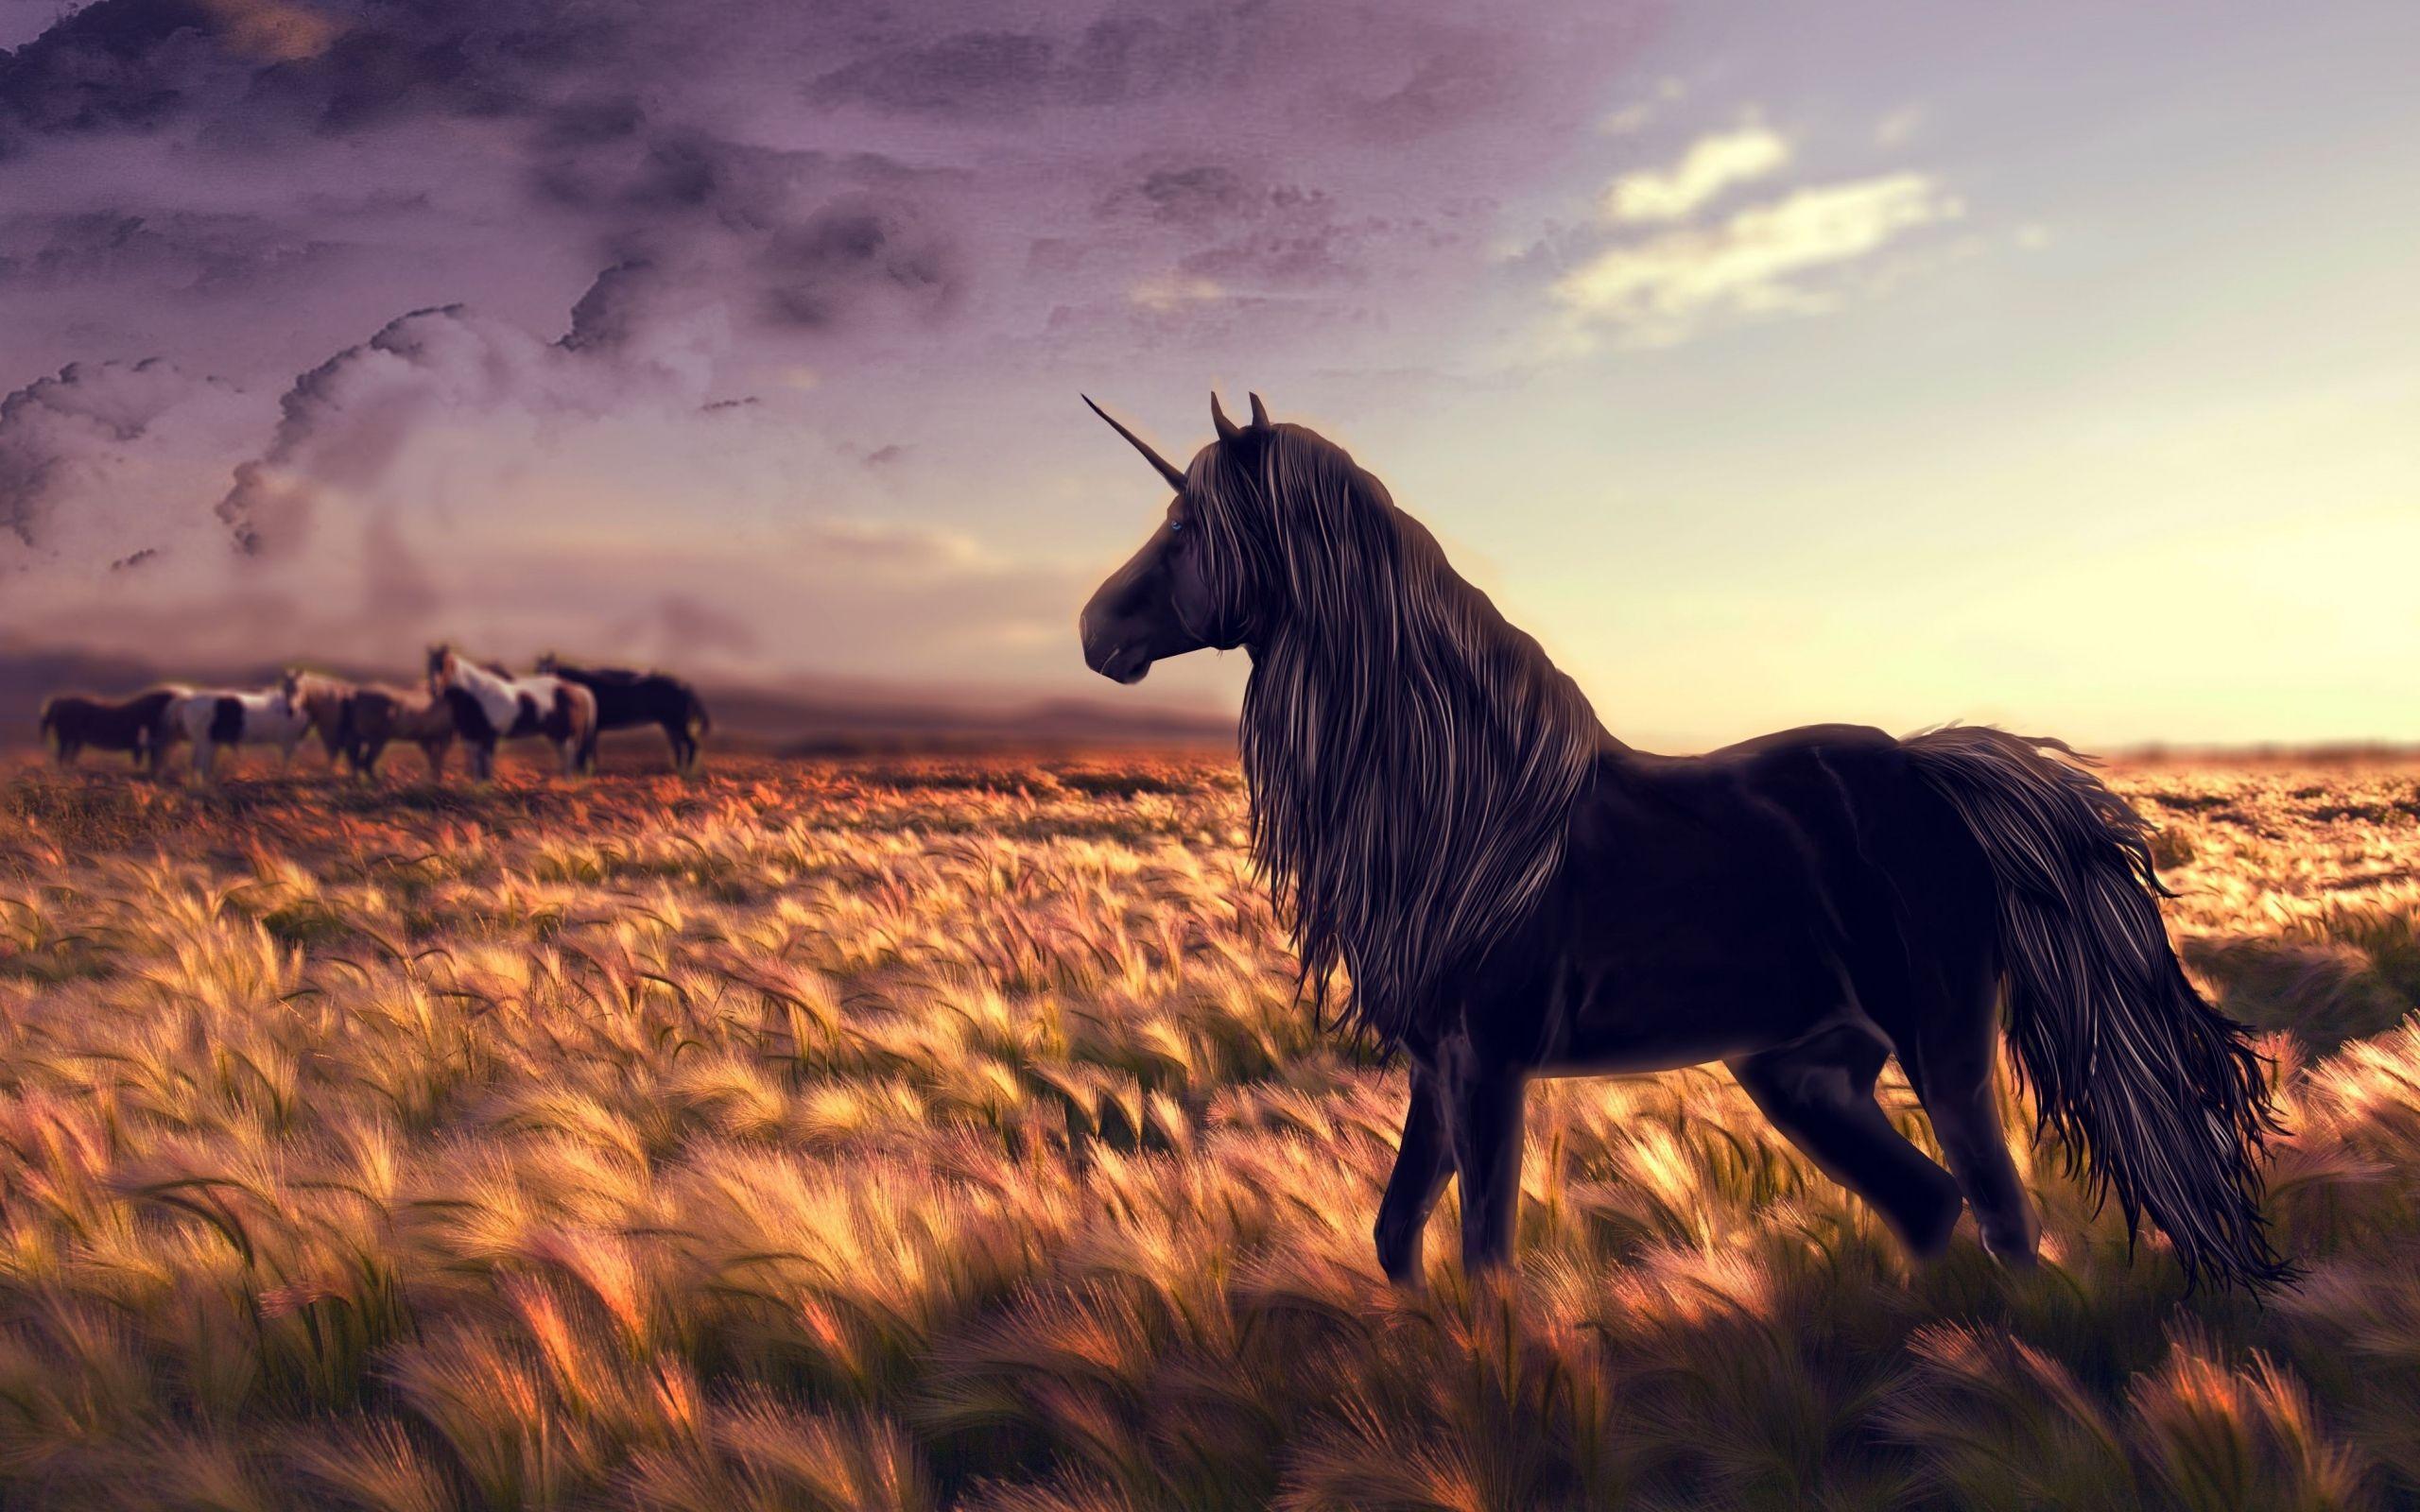 Best Wallpaper Horse Magic - fb28a35a3f86aefdbe2ef4a556ea87b6  Graphic_267178.jpg